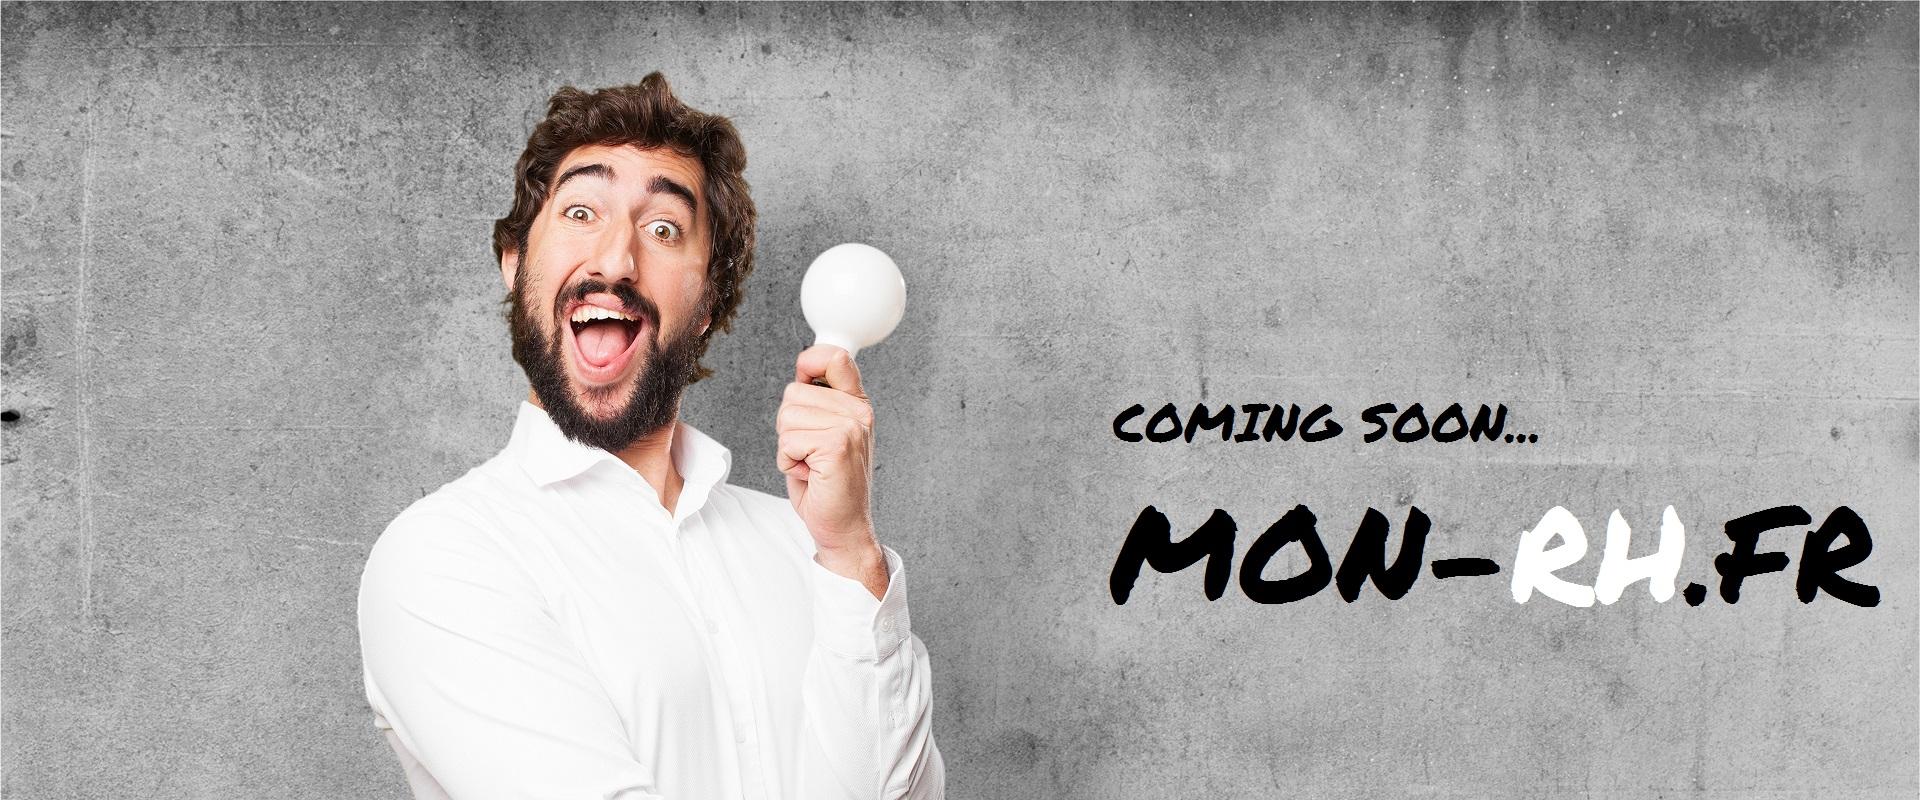 mbc consulting - MBC CONSULTING PRÉSENTE MON-RH.FR